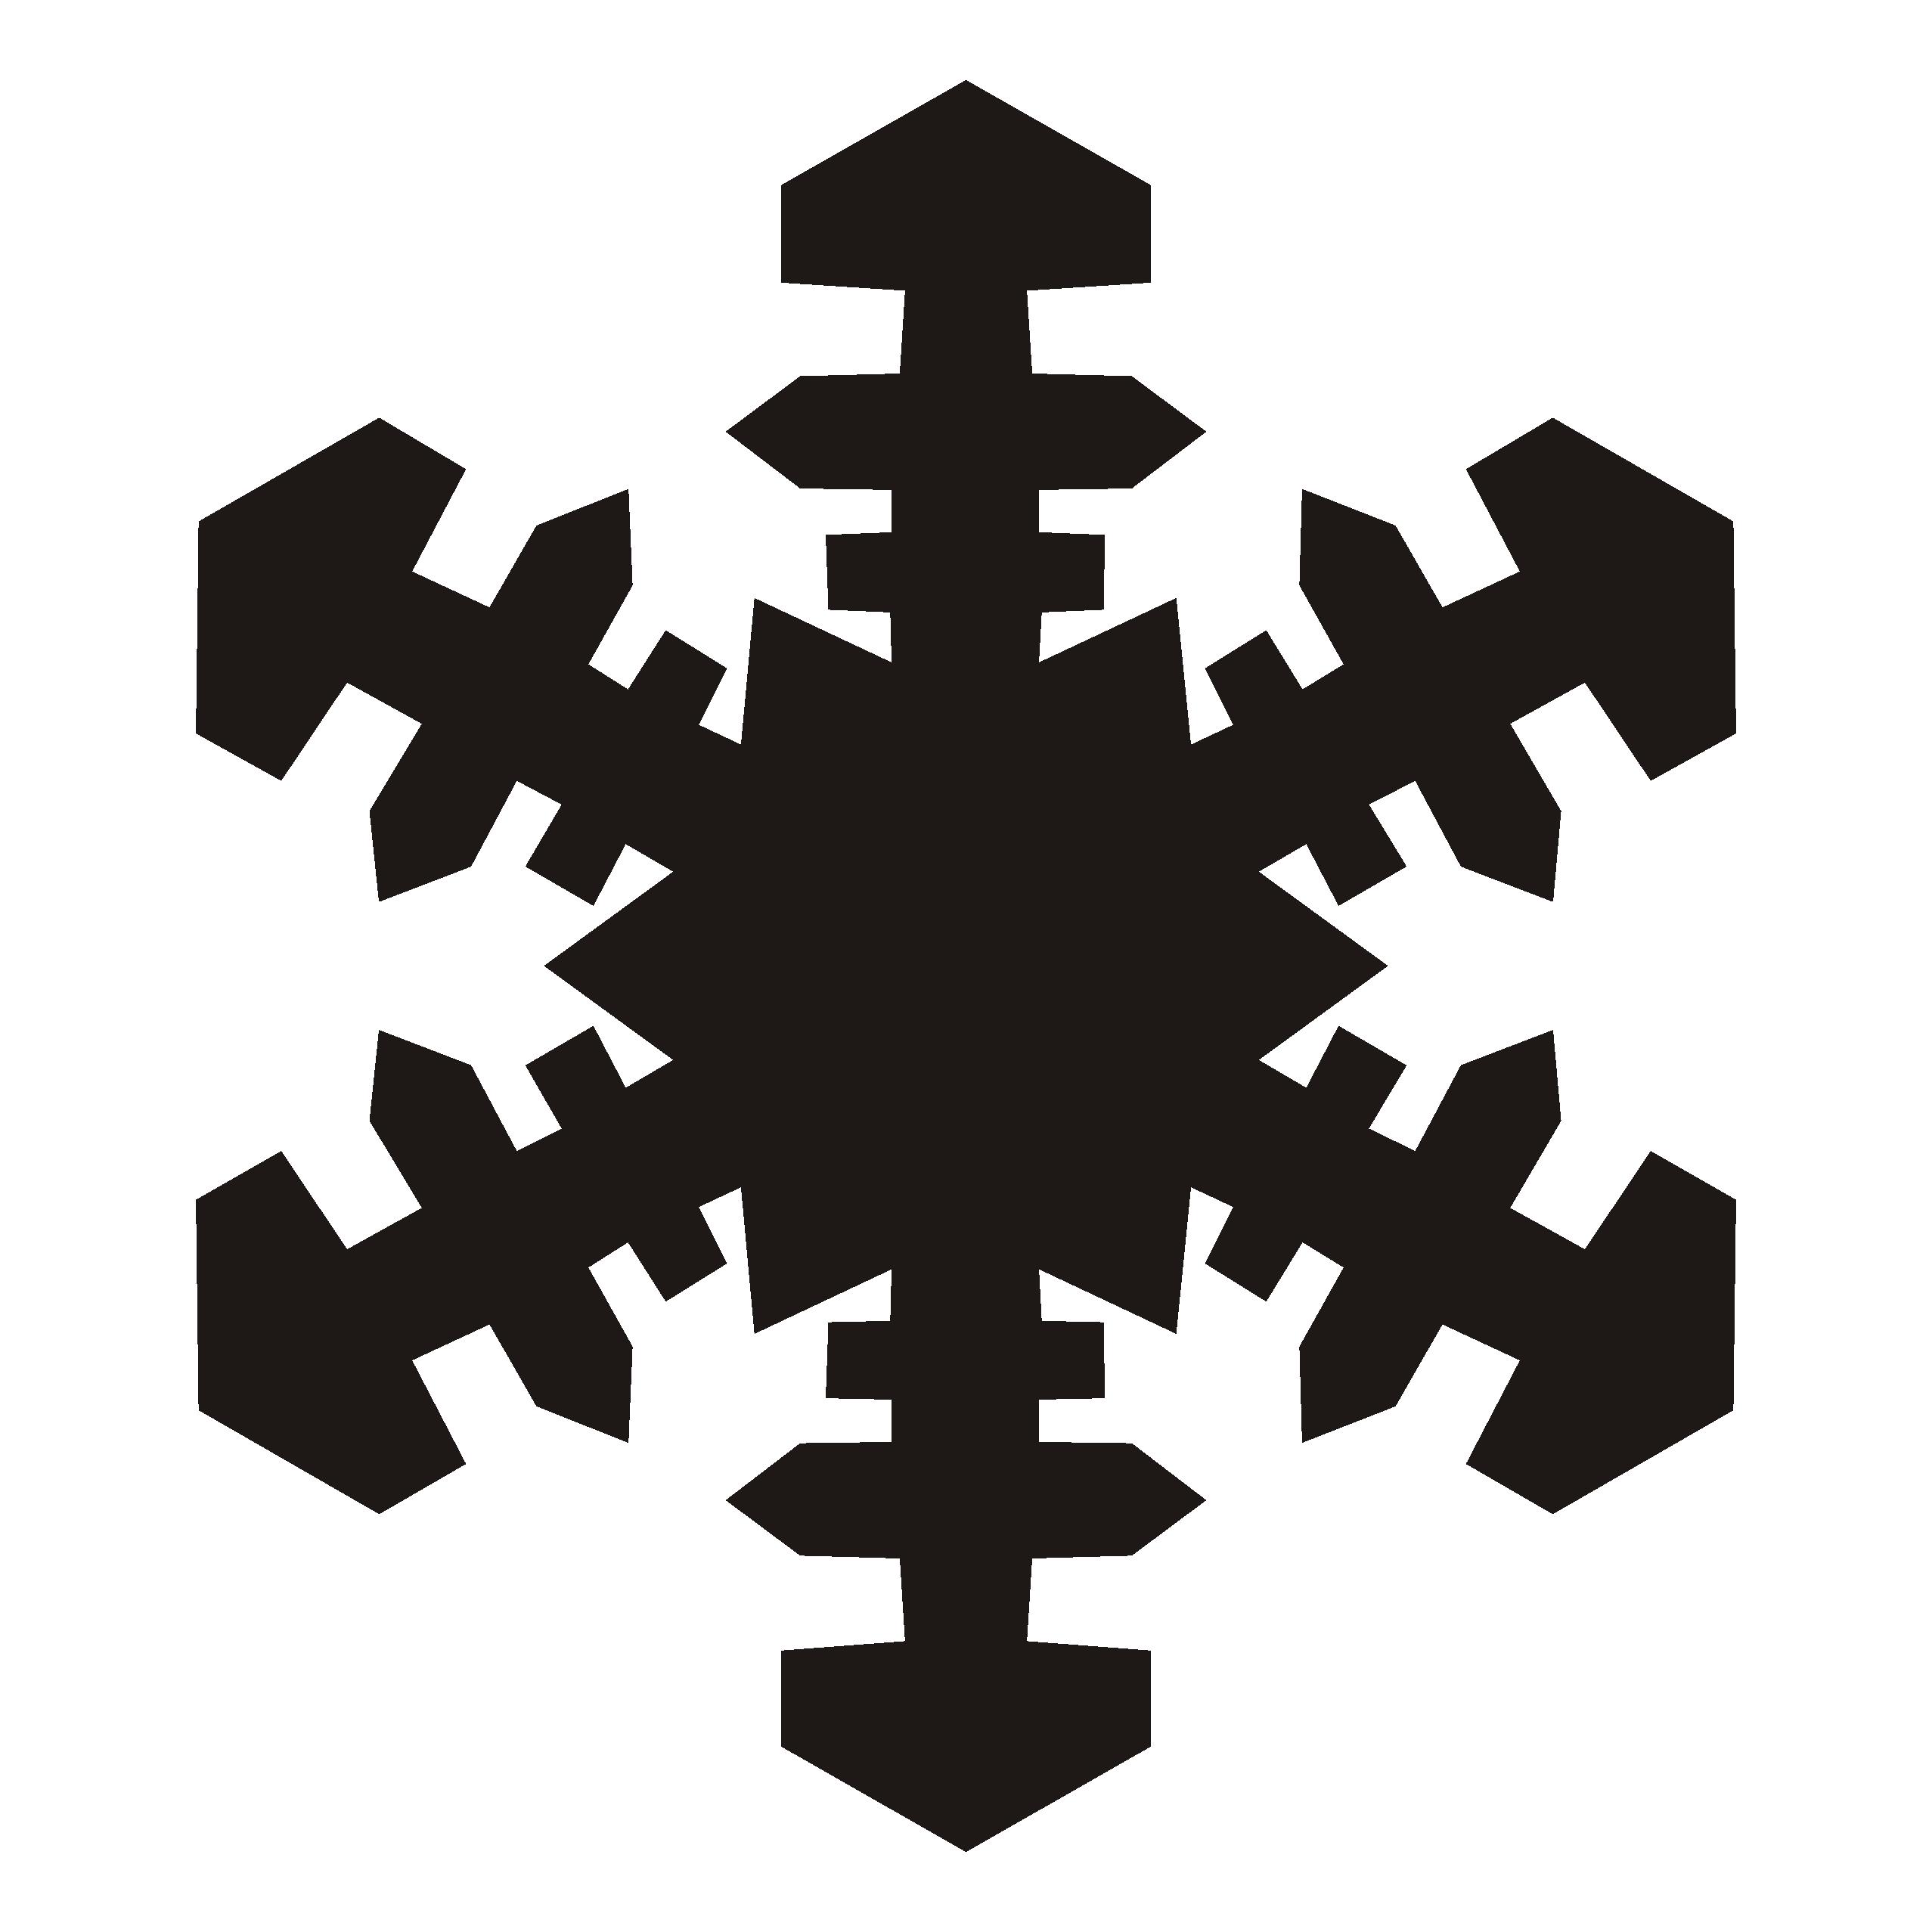 Snowflake Clipart Black And White | Clipart Panda - Free ...